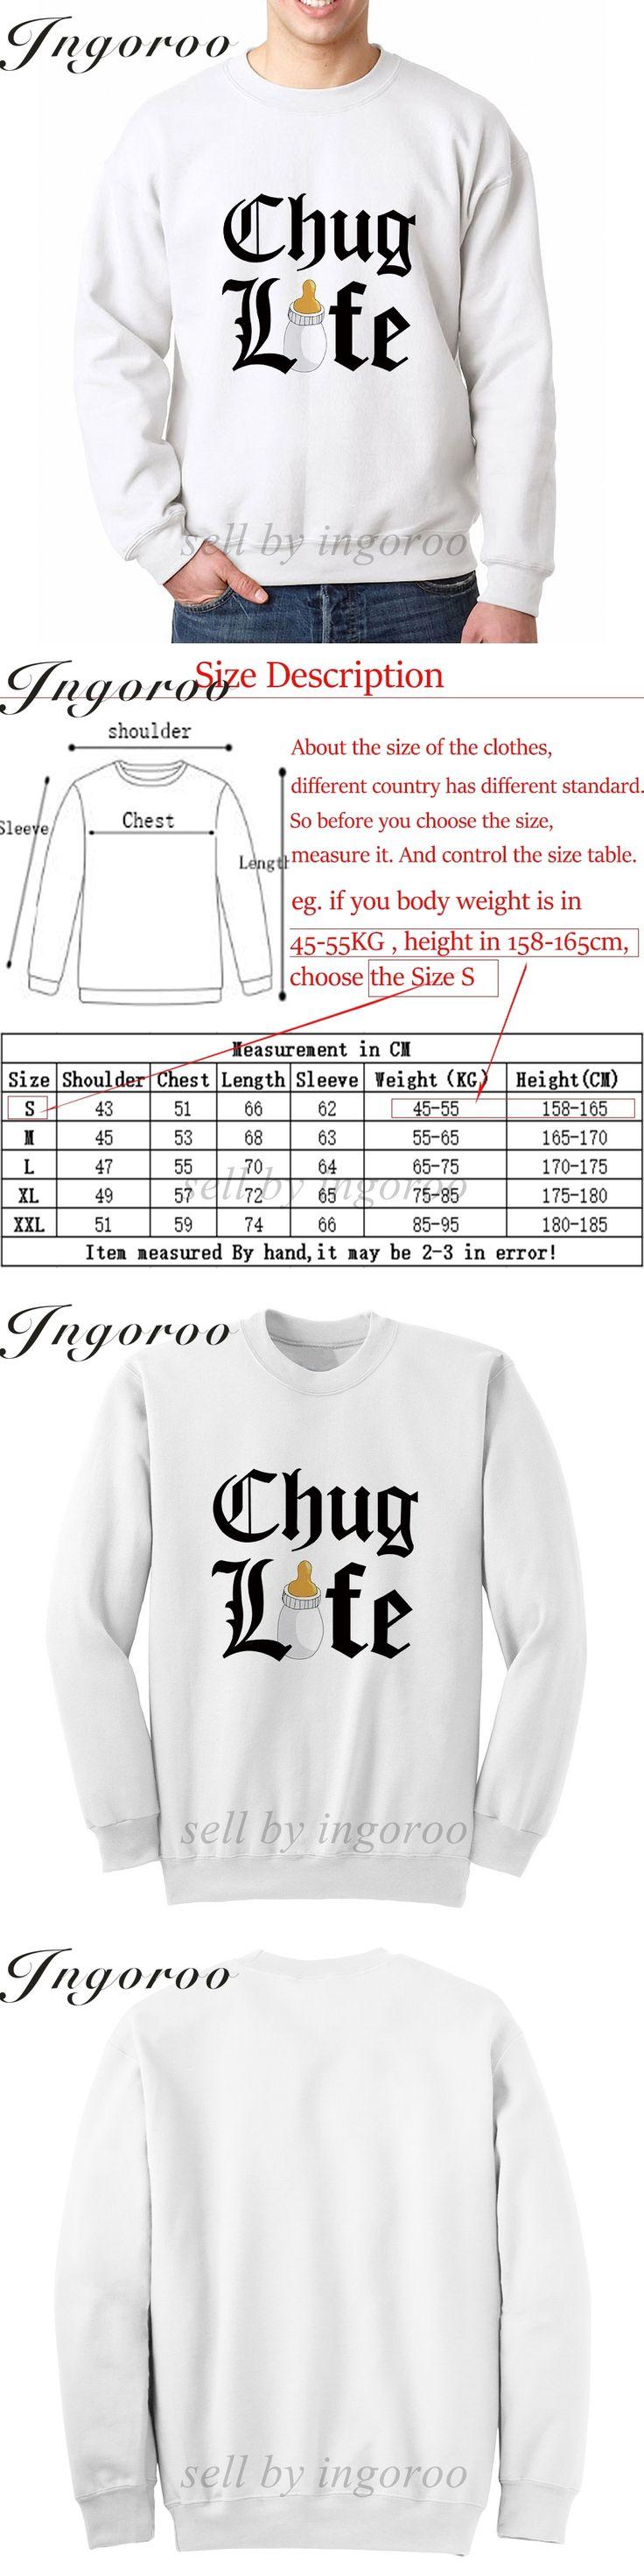 Babaseal Chug Life 2 Print Letter Oversized Luminous Hoodies Hoody Off White Sweatshirt New 2017 Cloak Hoodie Bts Sweatshirts